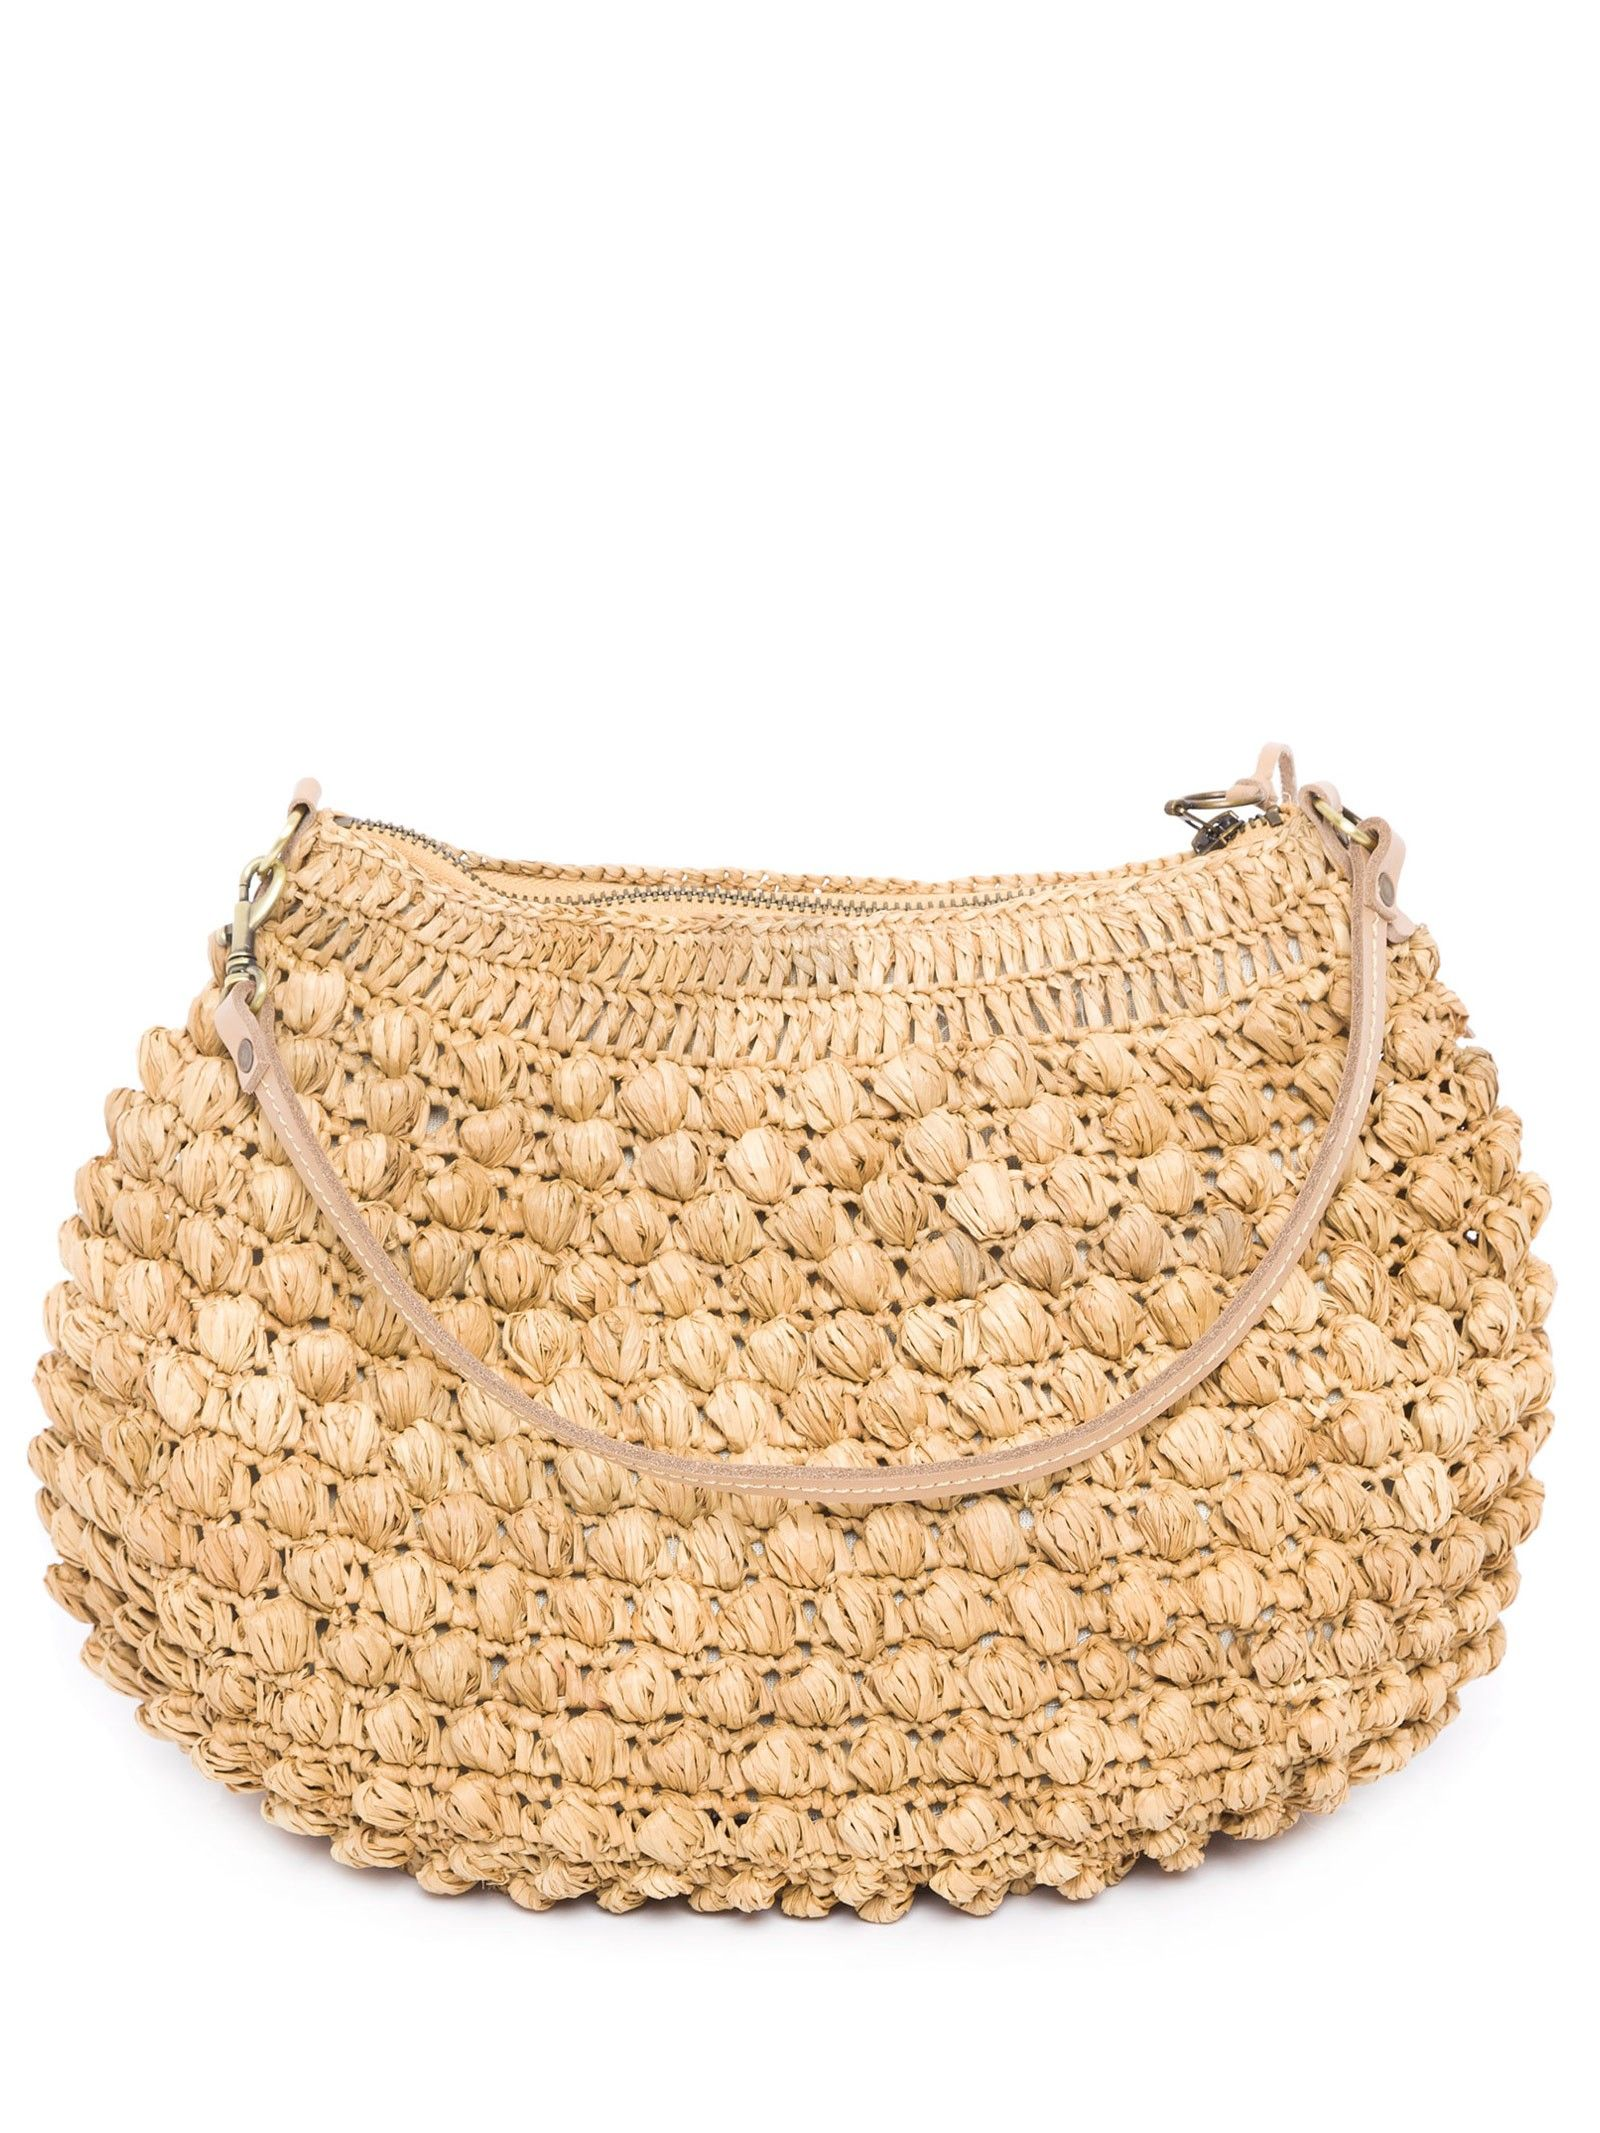 c337afc73 Bolsa de crochet de fio de palha | BOLSAS | BAG | Crochet patterns ...